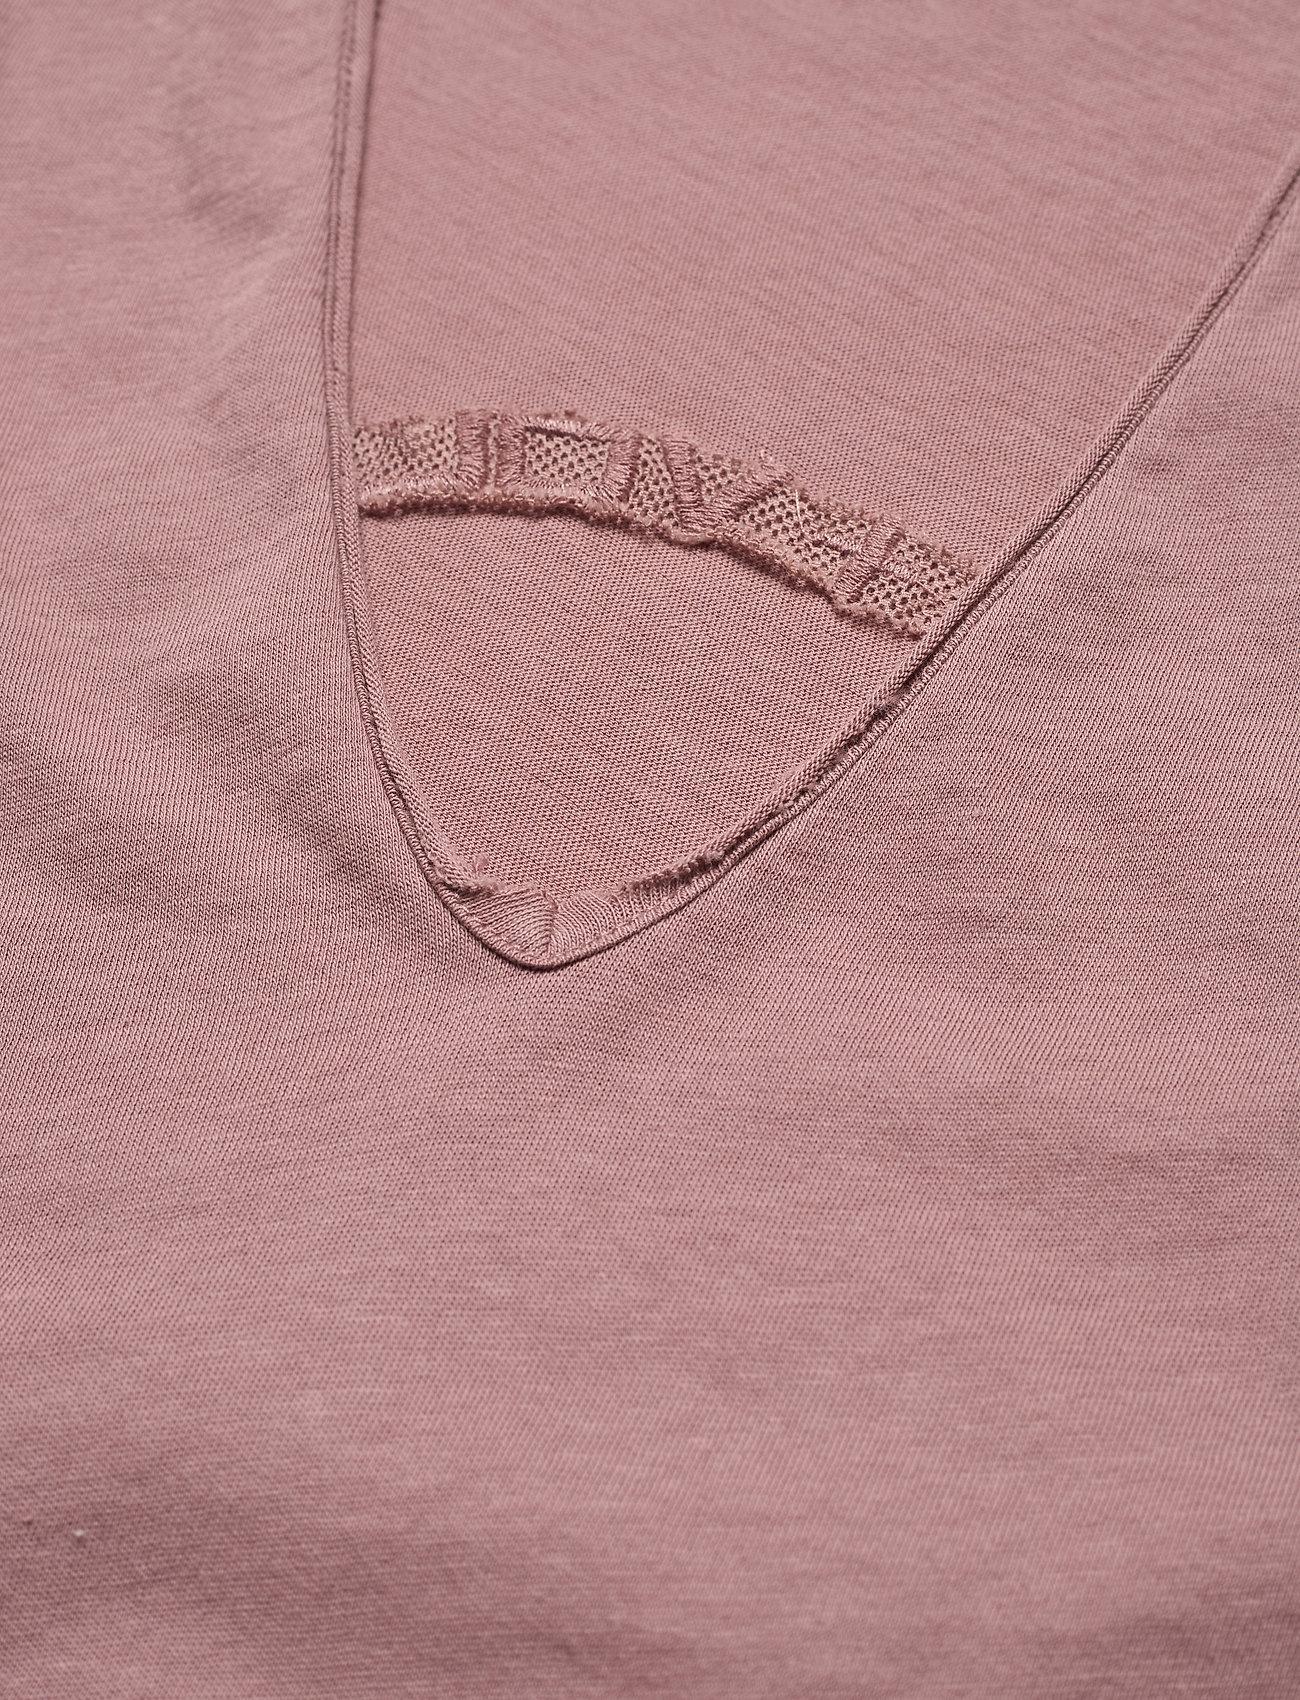 Zadig & Voltaire - STORY FISHNET V-NECK COTTON T-SHIRT - t-shirts - violet - 2